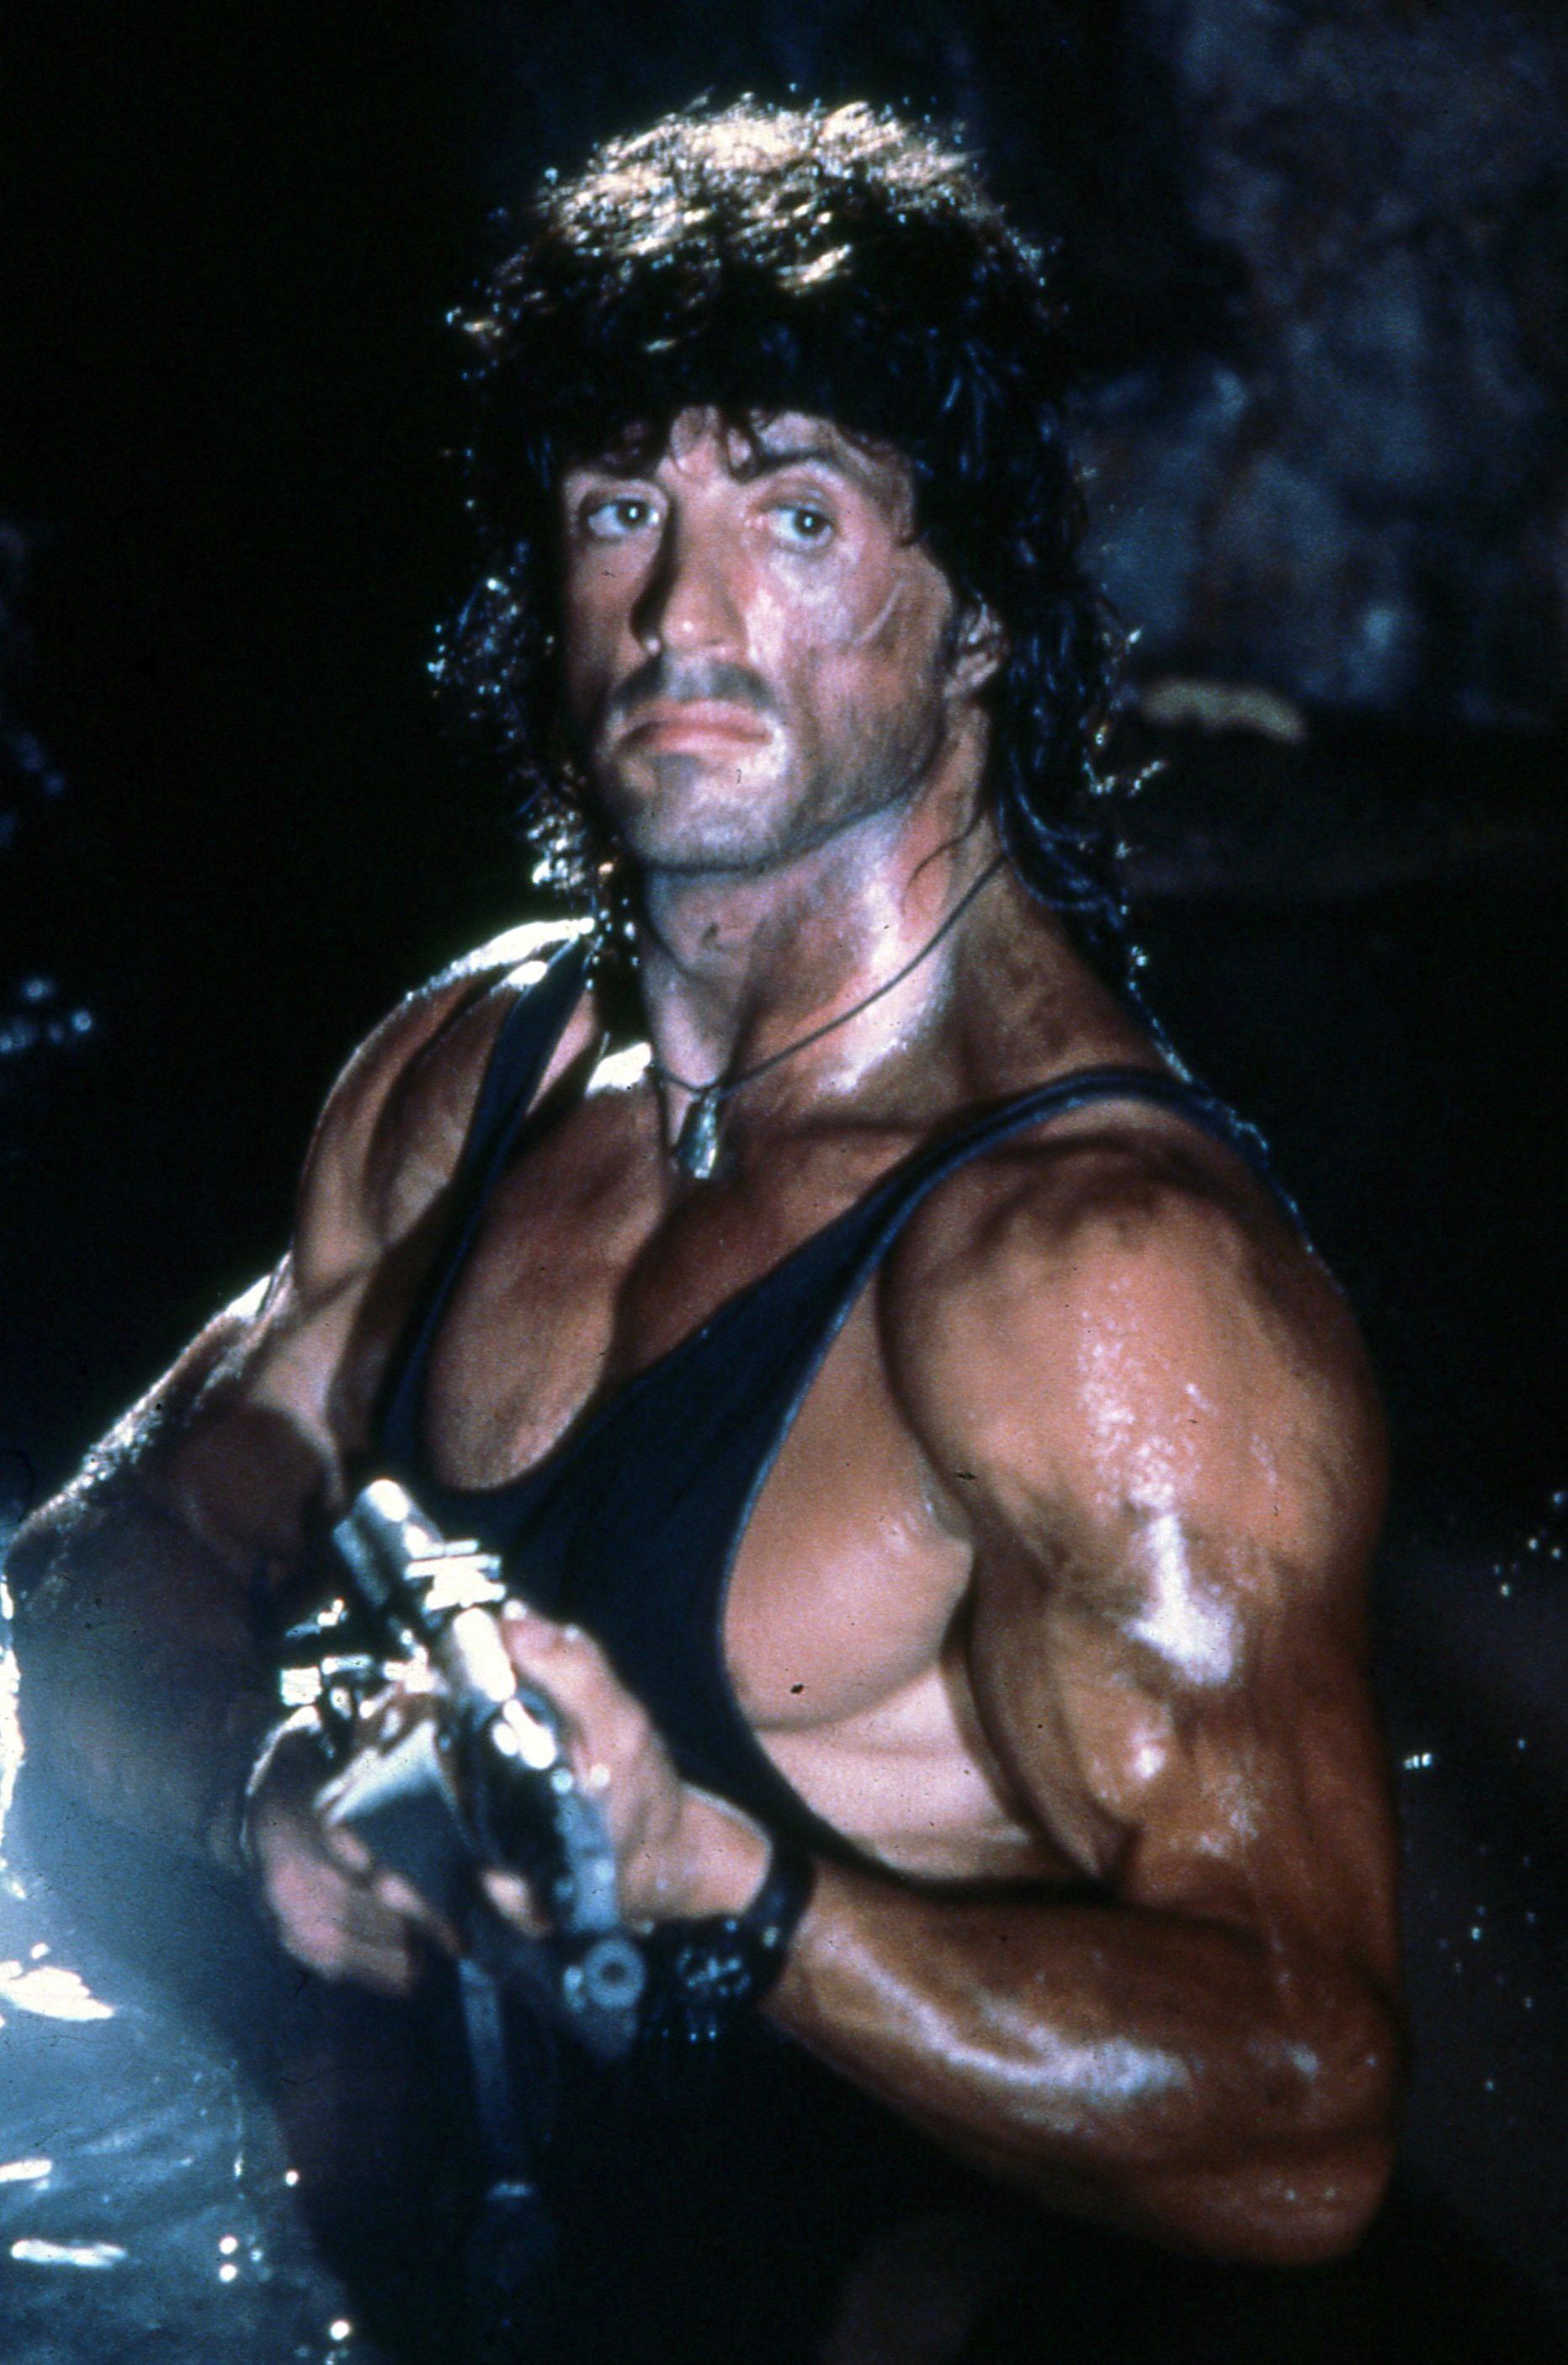 Depiction of Rambo